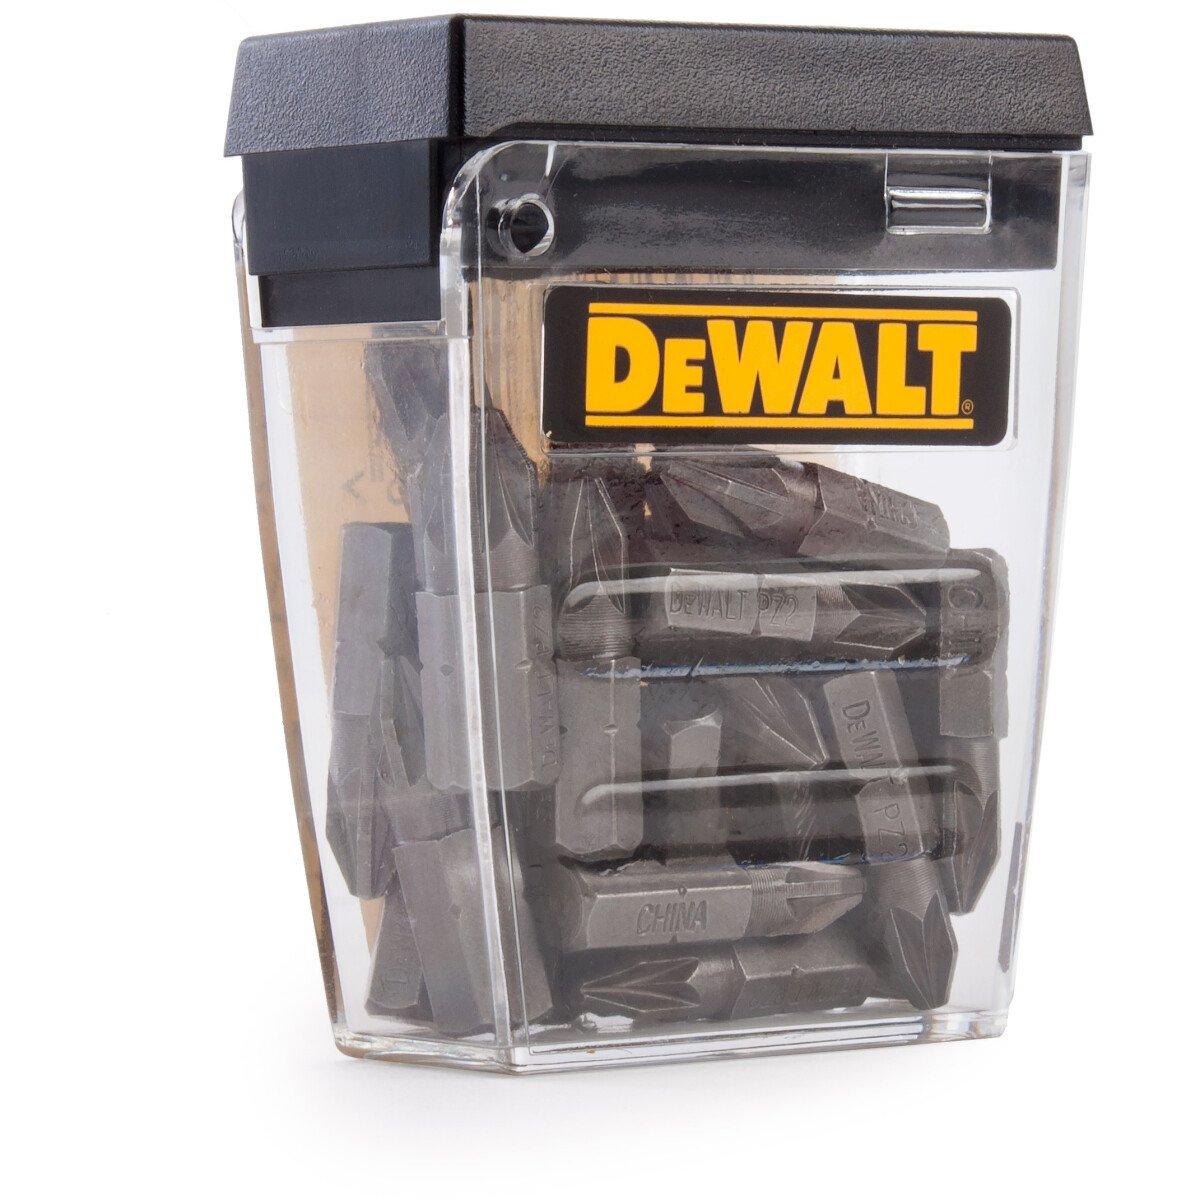 Dewalt DT71521-QZ Screwdriving Bits PZ2 Pack of 25 in Tic Tac Box 25mm Length